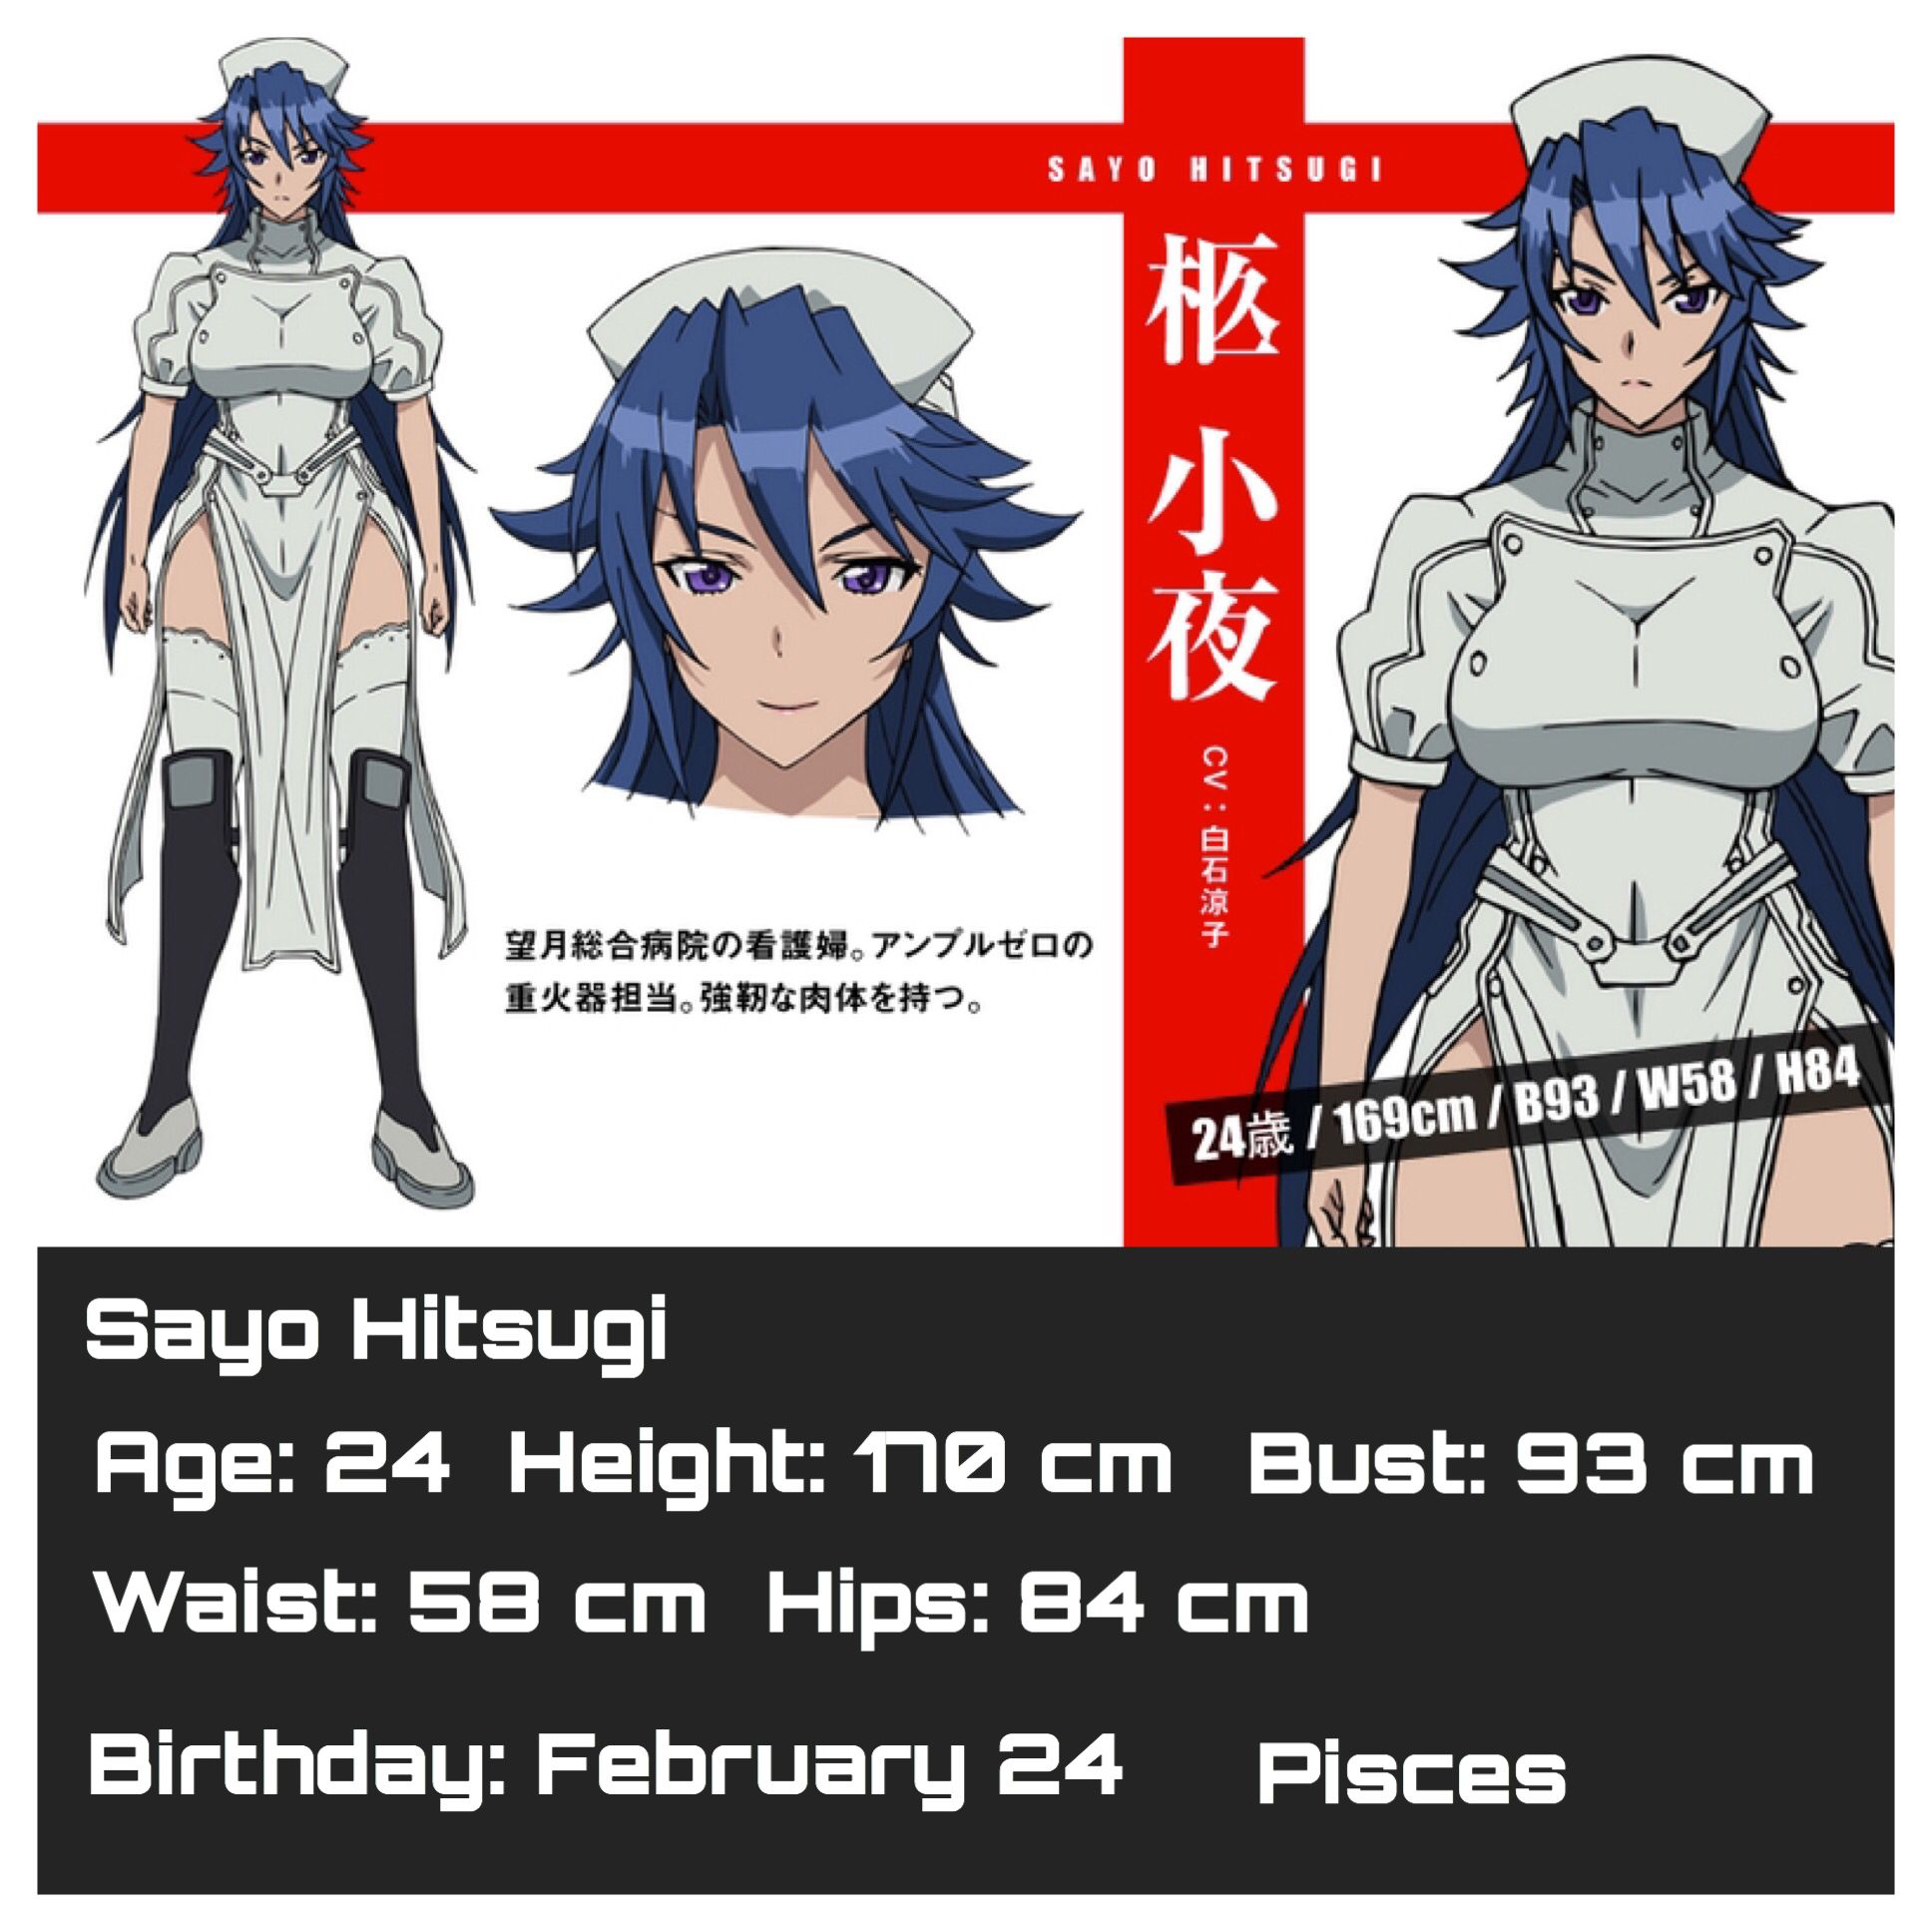 Triage Anime Characters : Sayo hitsugi profile triage anime pinterest